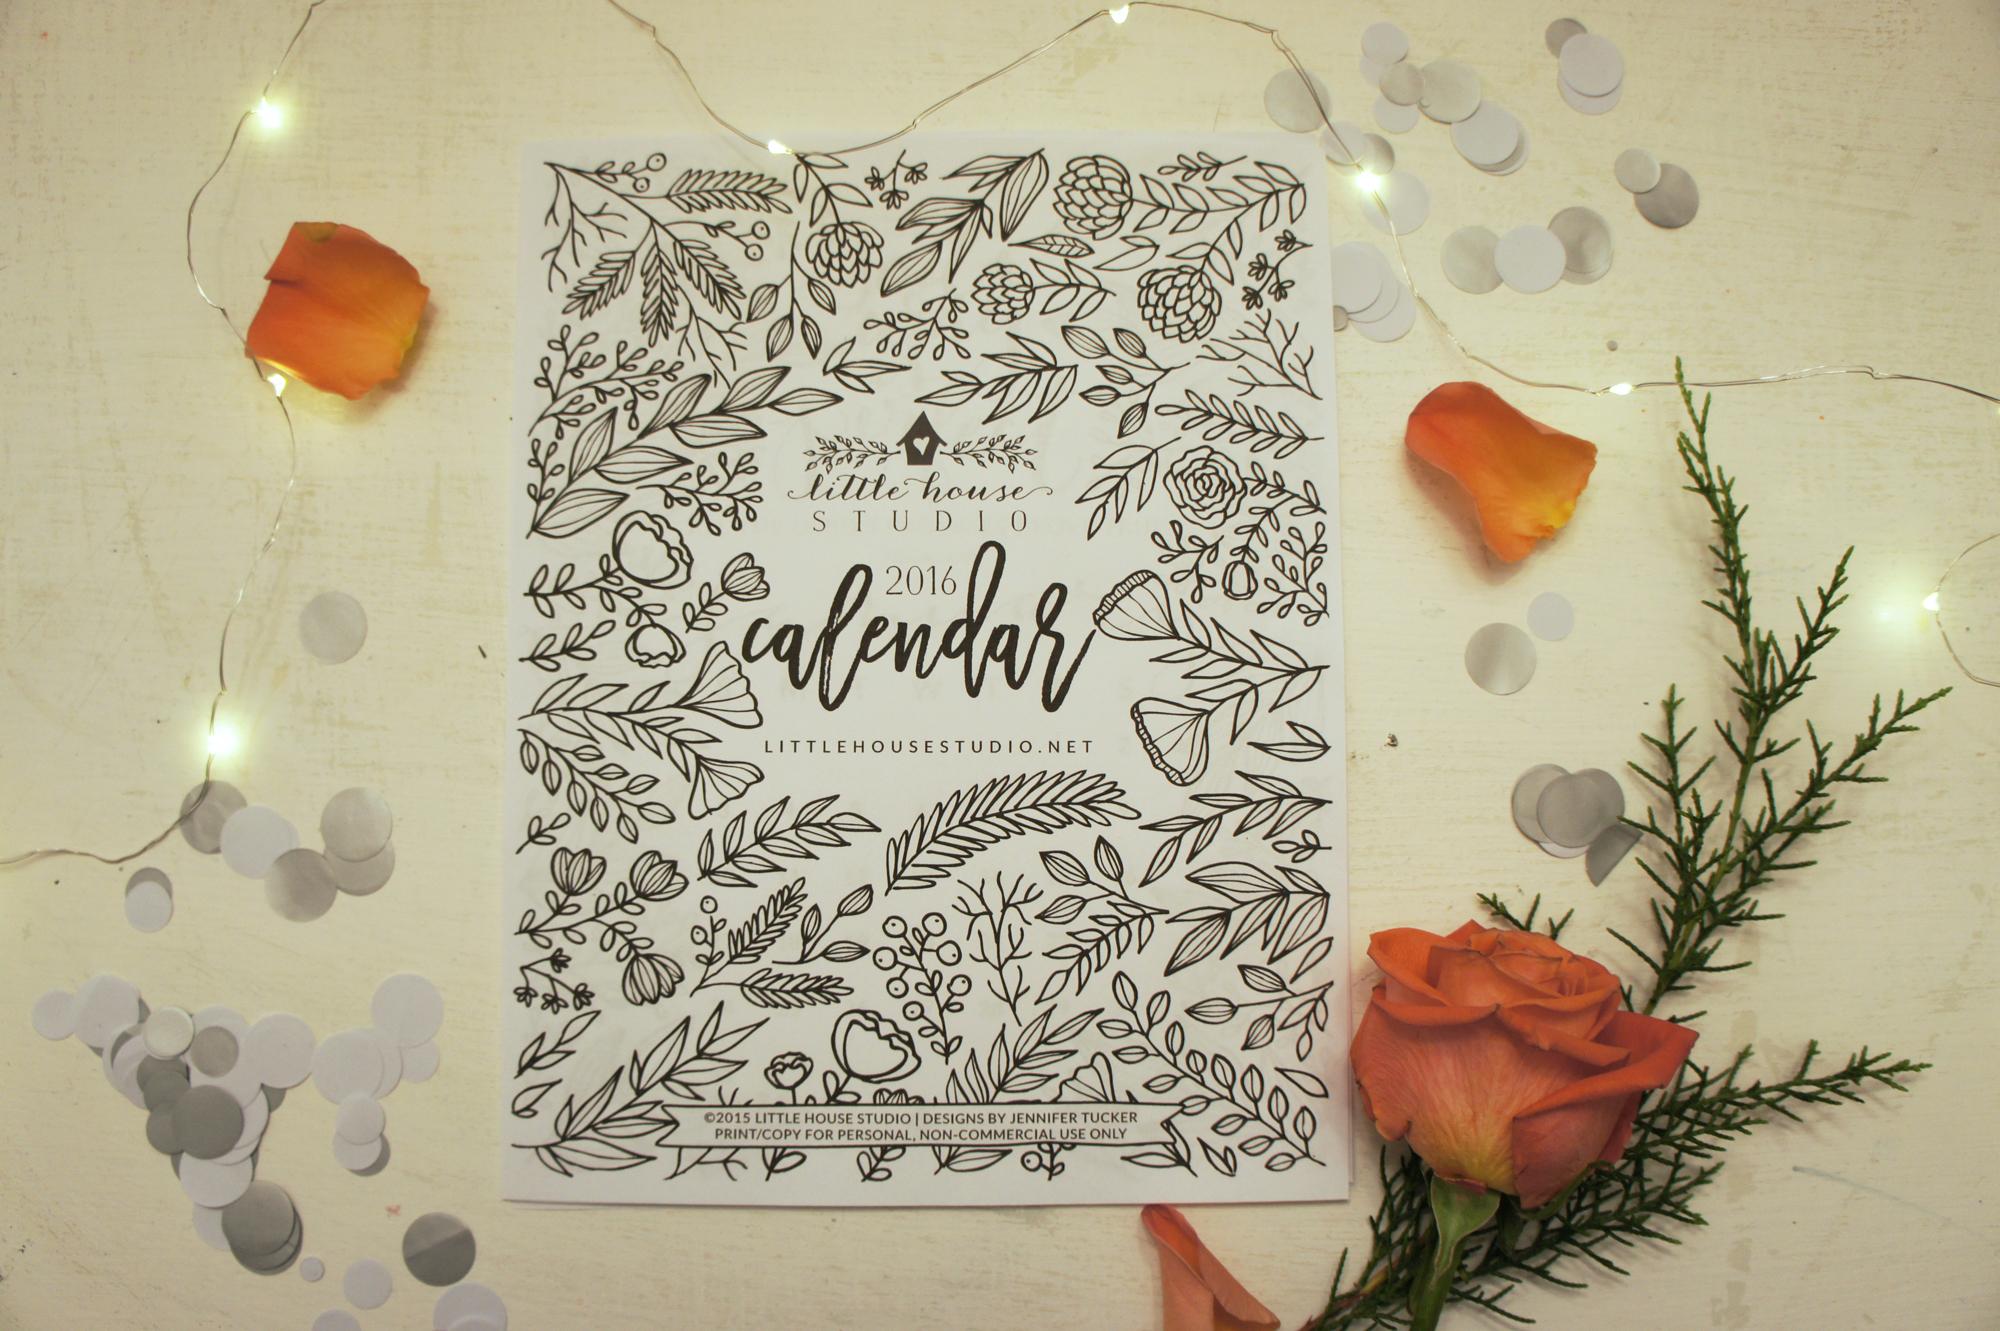 2016 Calendar - Little House Studio